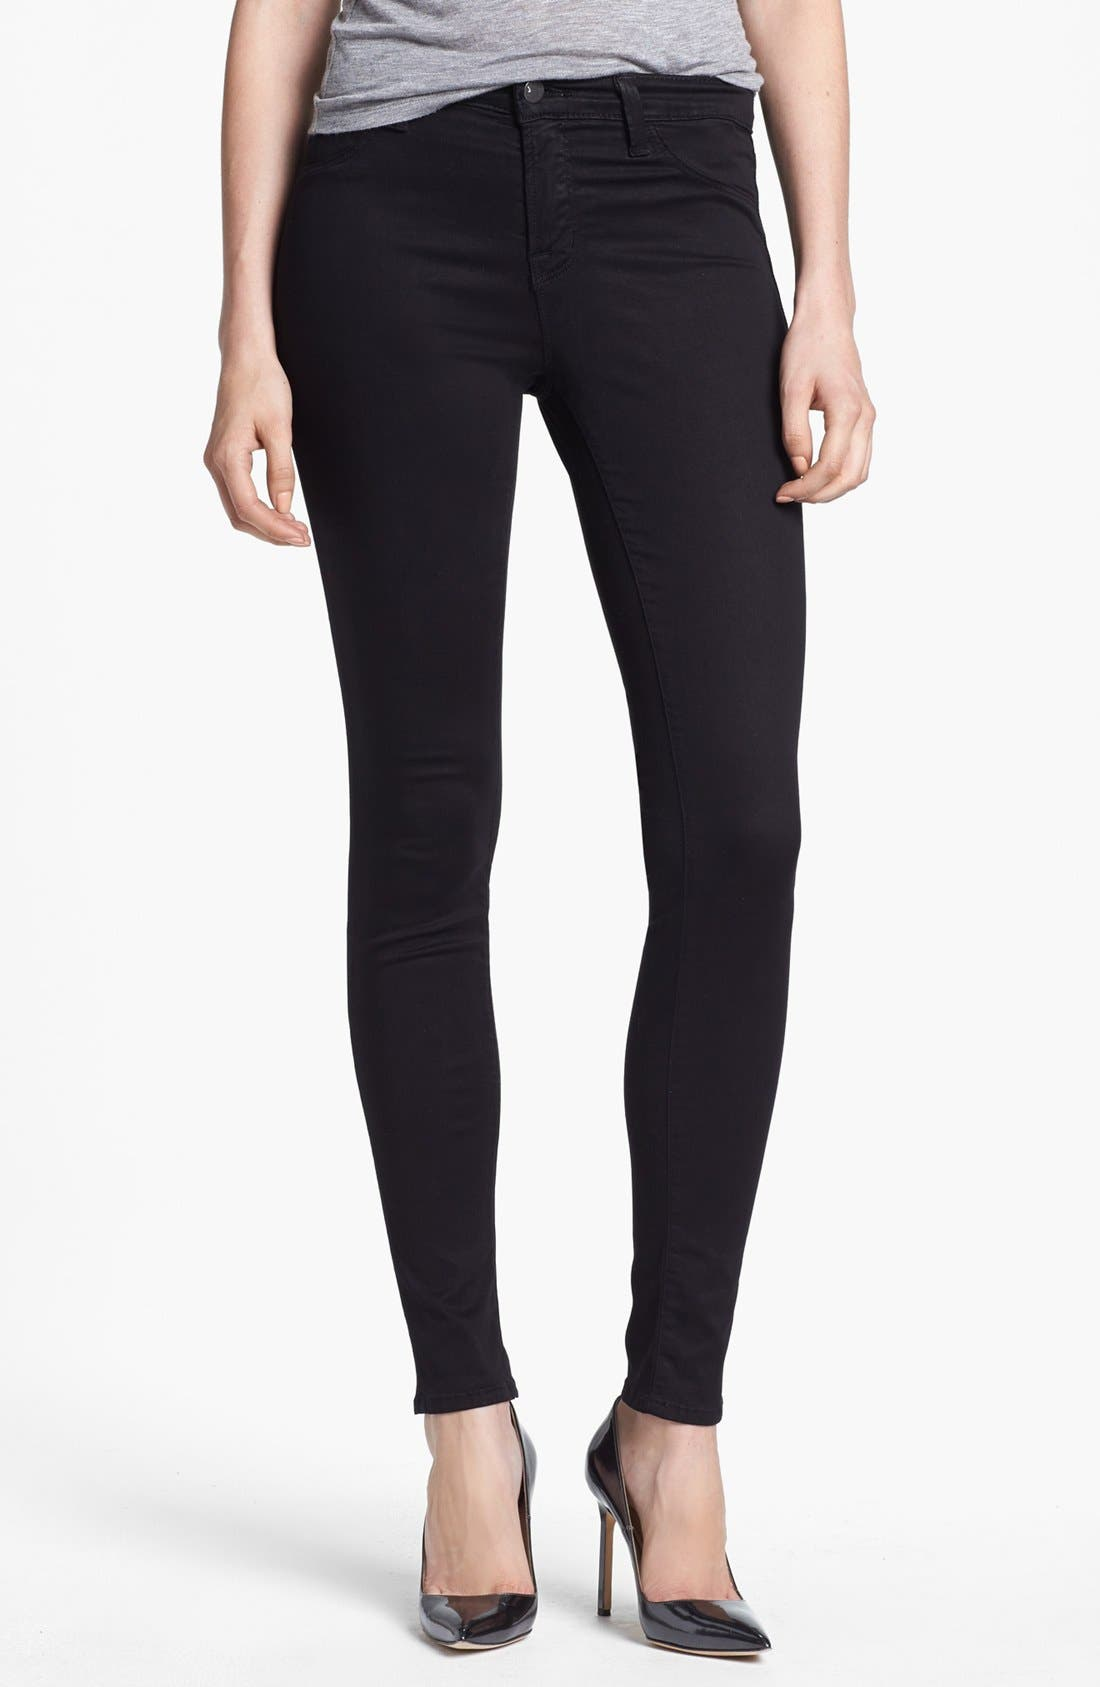 J BRAND, '485' Mid Rise Super Skinny Jeans, Main thumbnail 1, color, 103